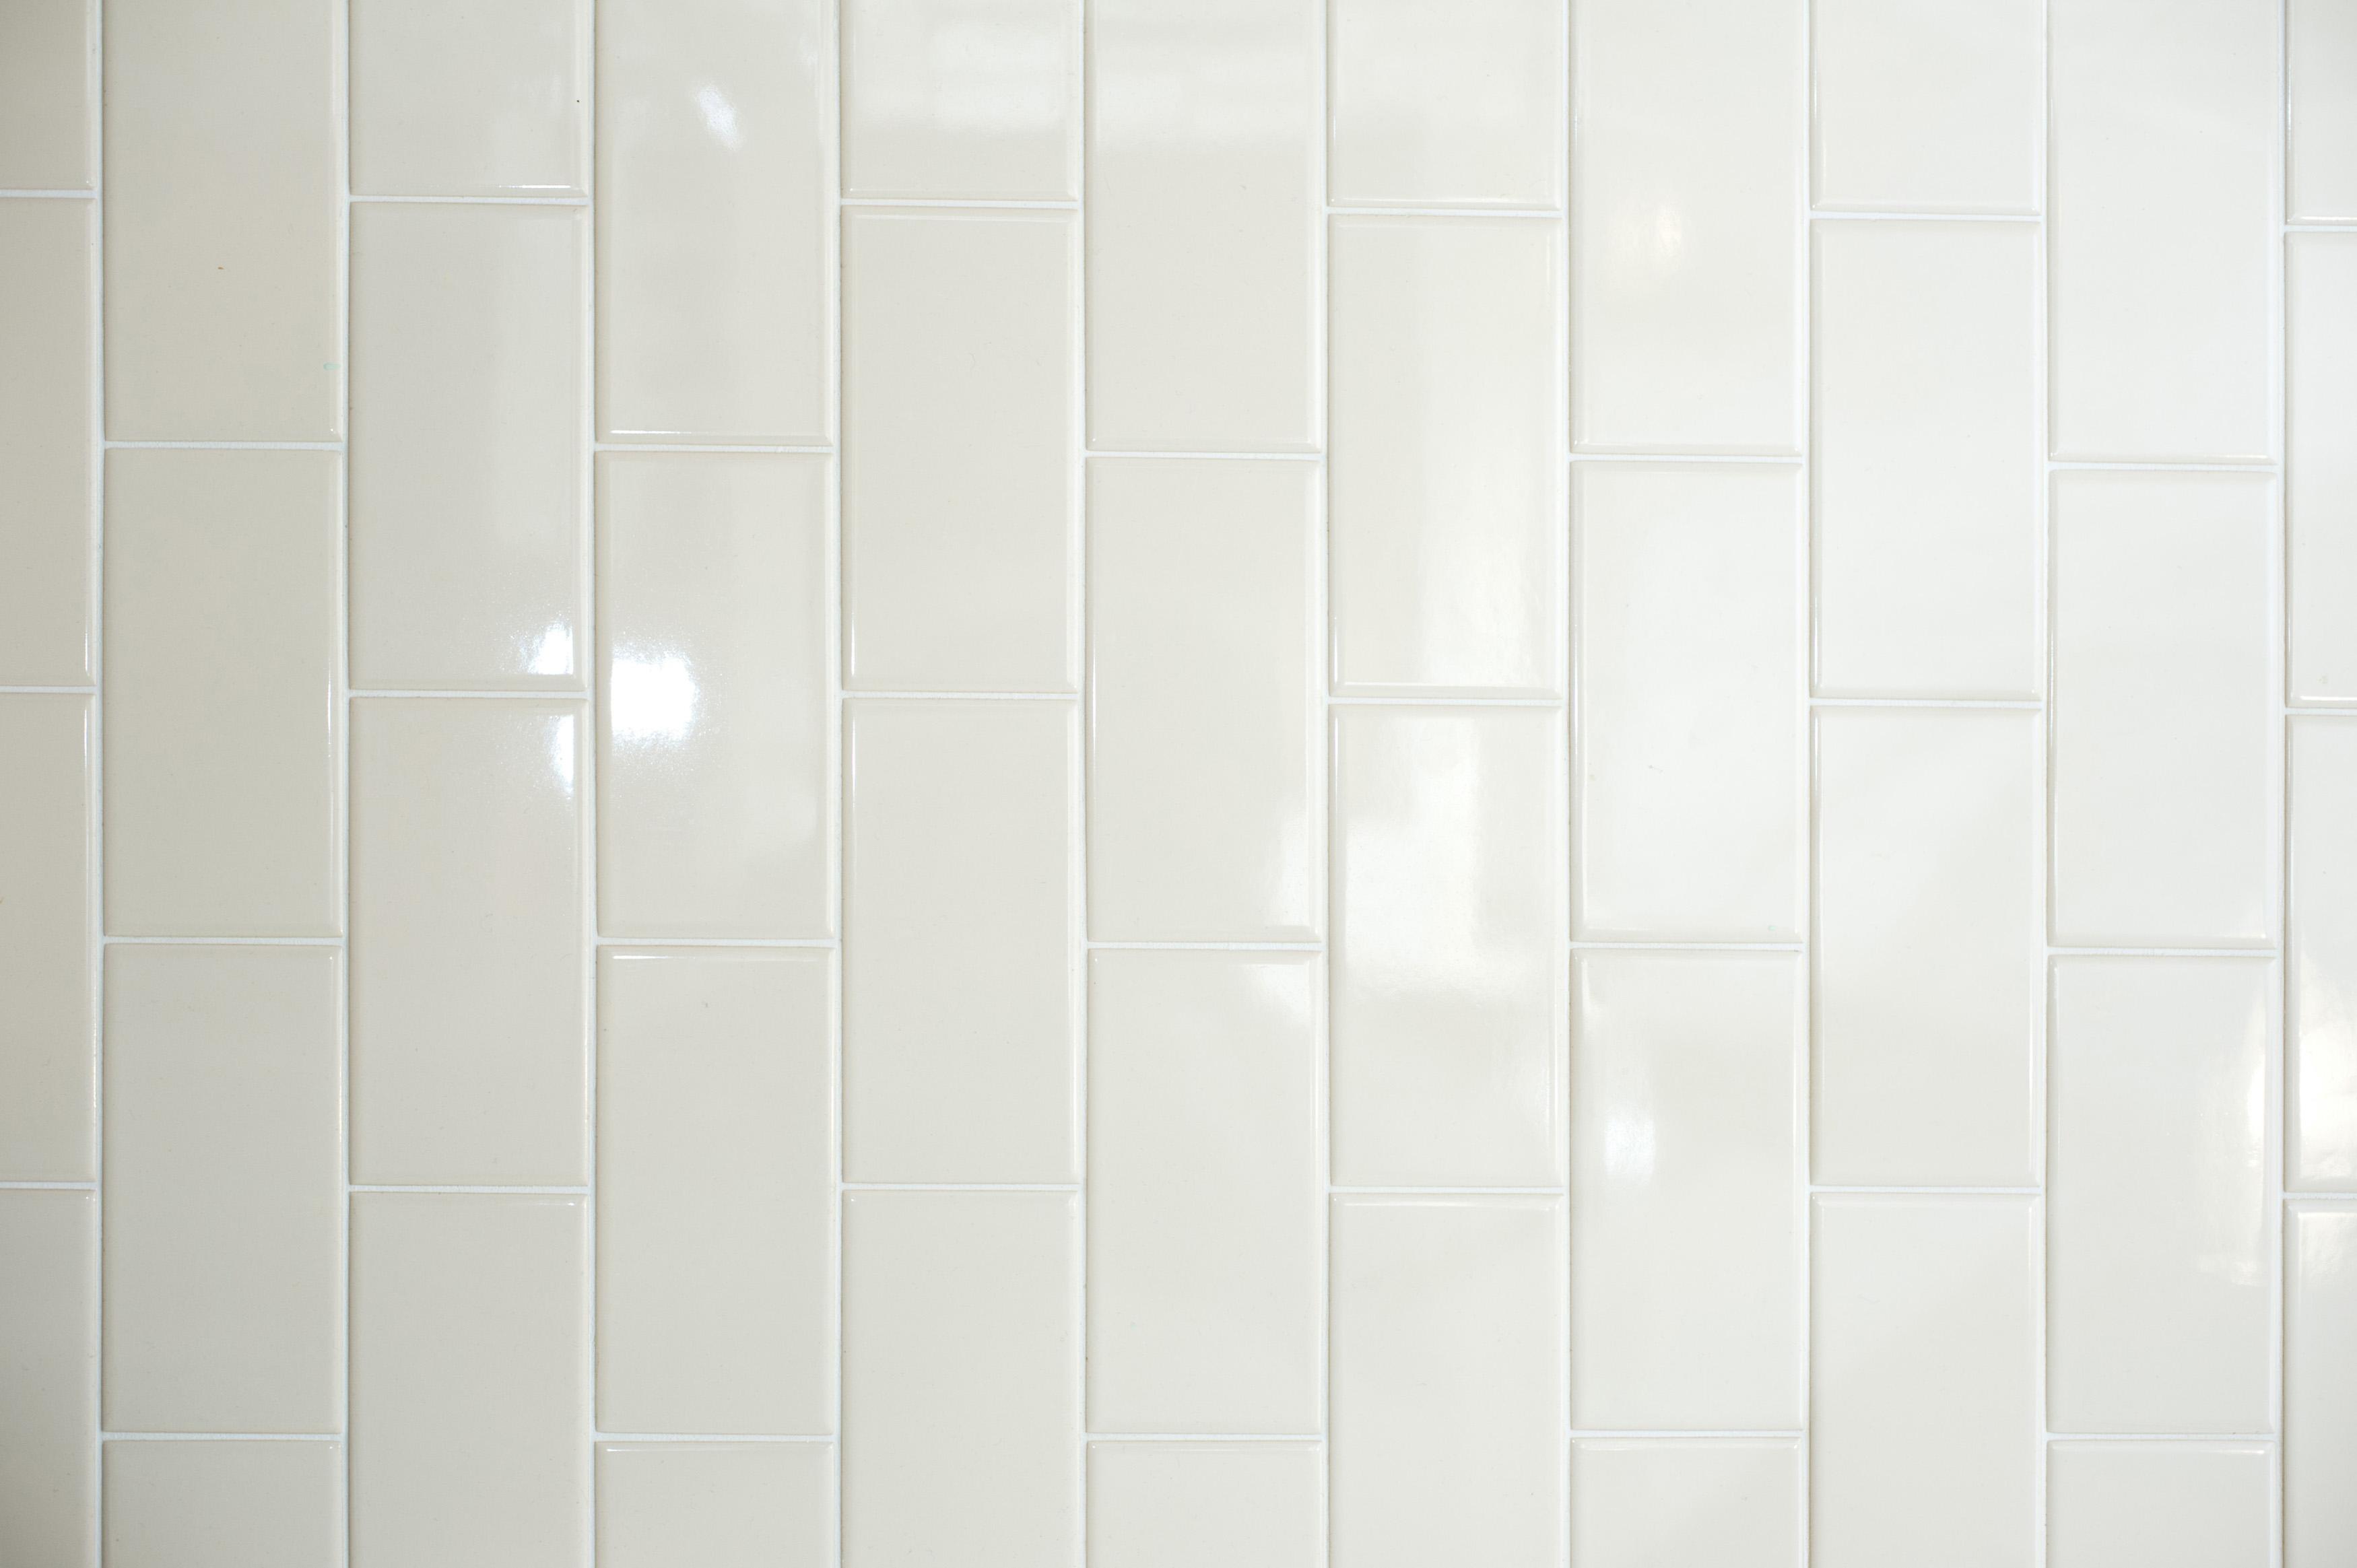 Free image of long white vertical tiles